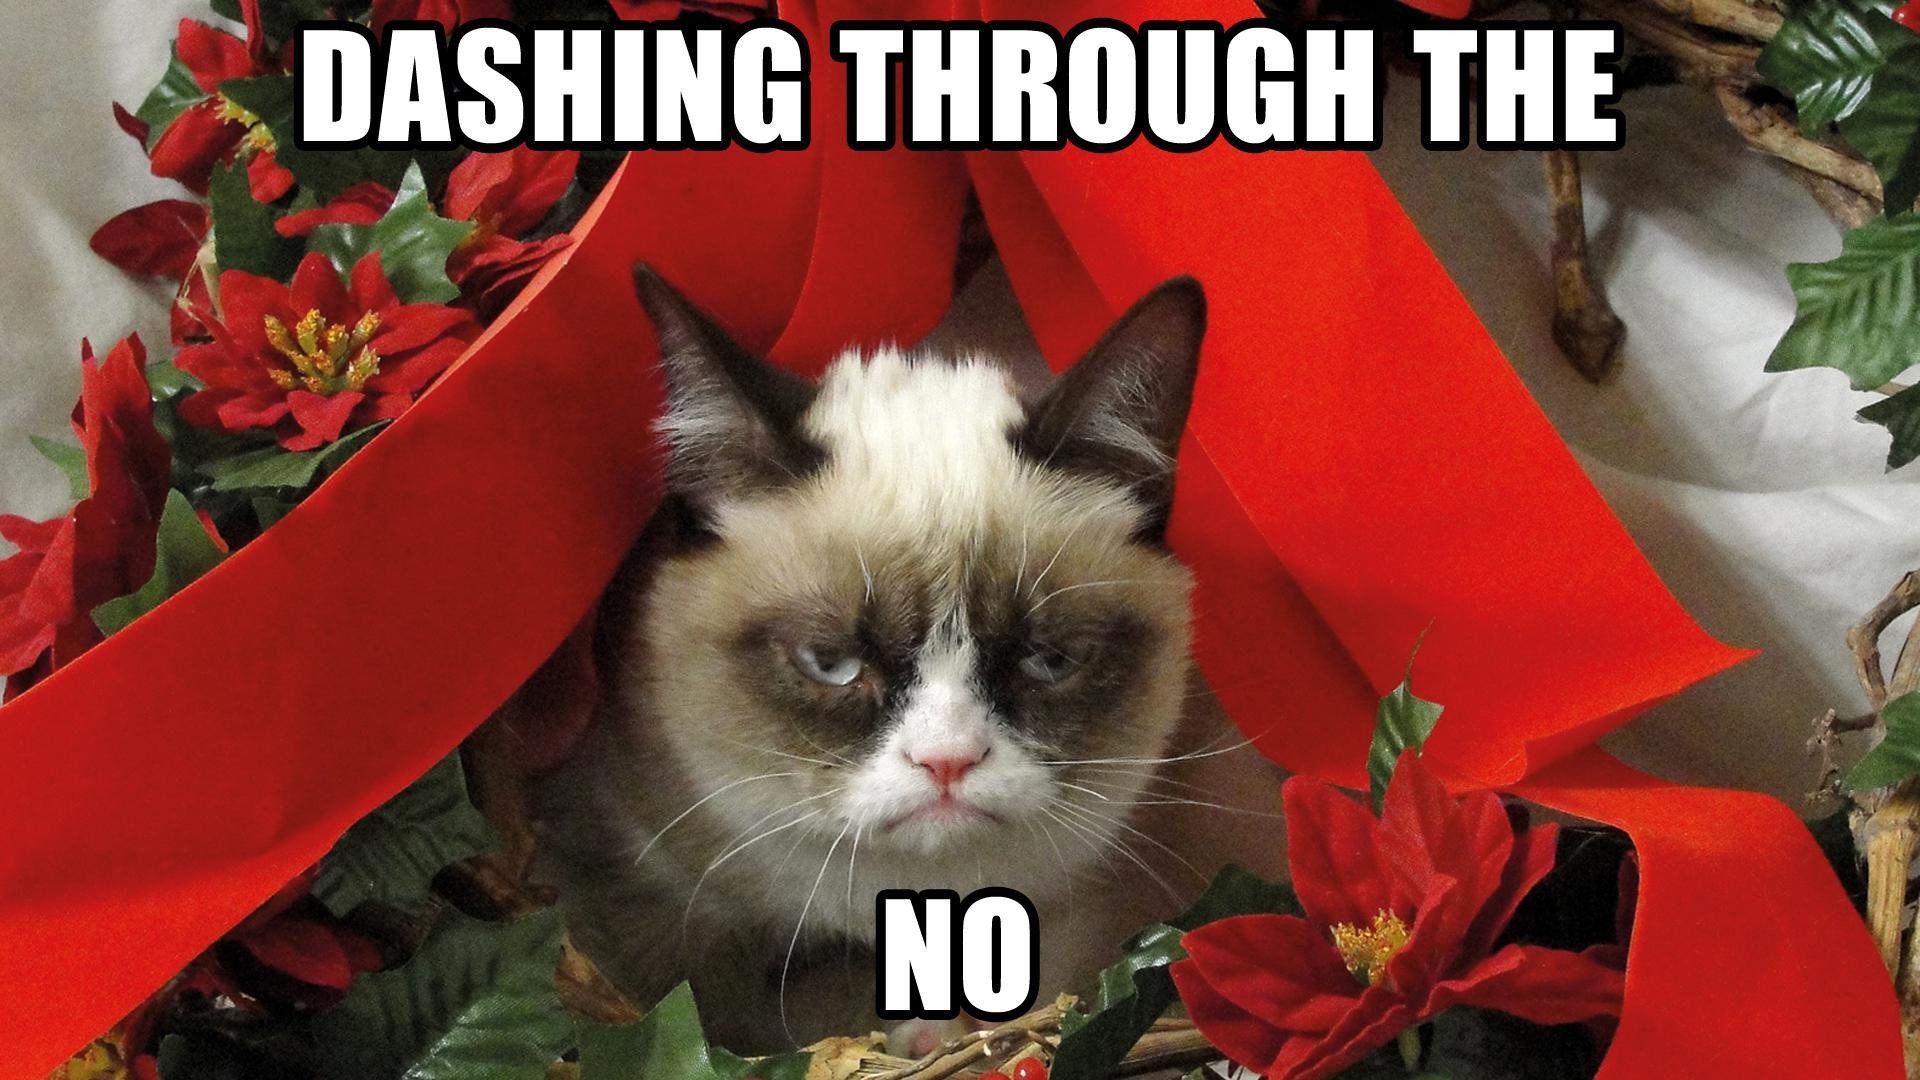 grumpy cat meme christmas tree - photo #6